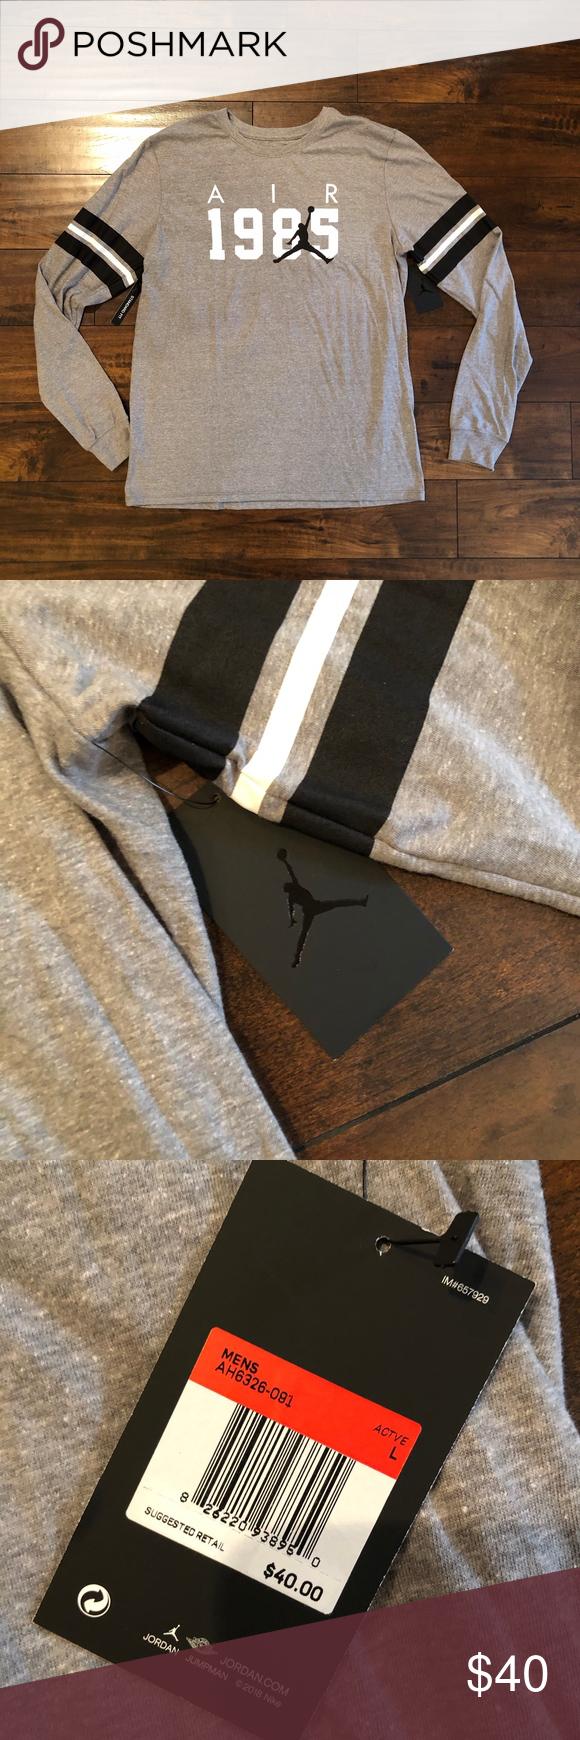 21314b74aaa5 🆕 ⭐ NWT Nike Air Jordan 1985 JSW 6 long-sleeve L Description ...